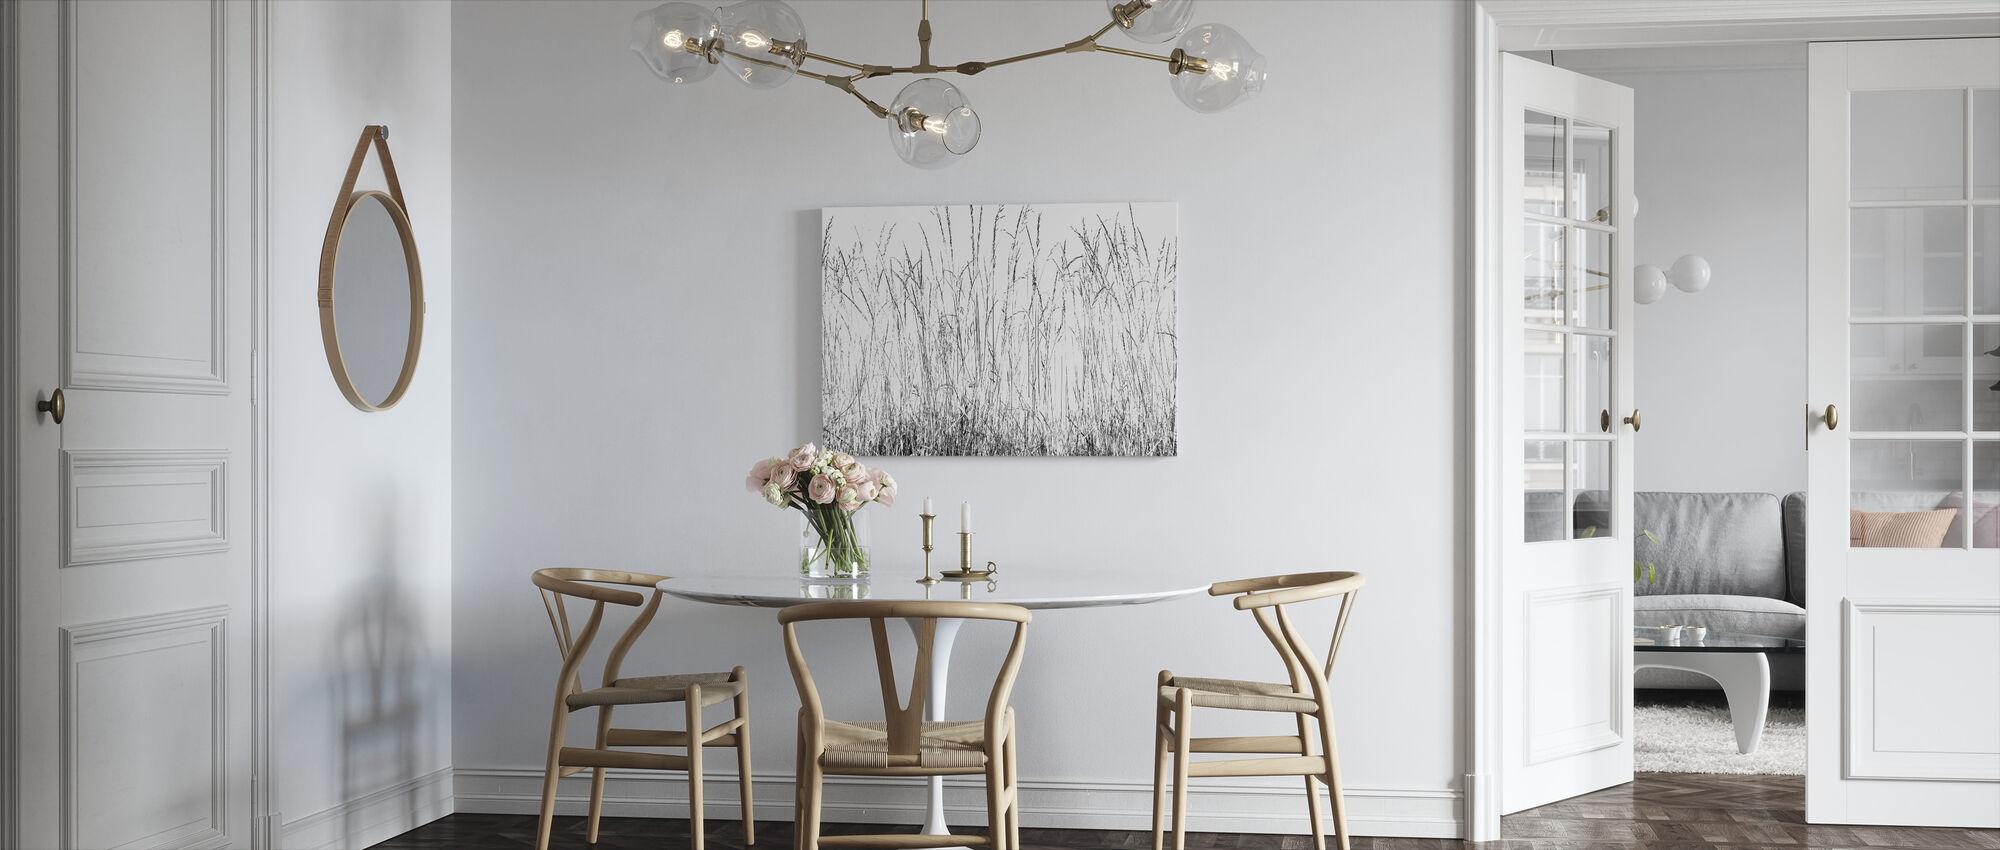 Gras messen bw - Canvas print - Keuken